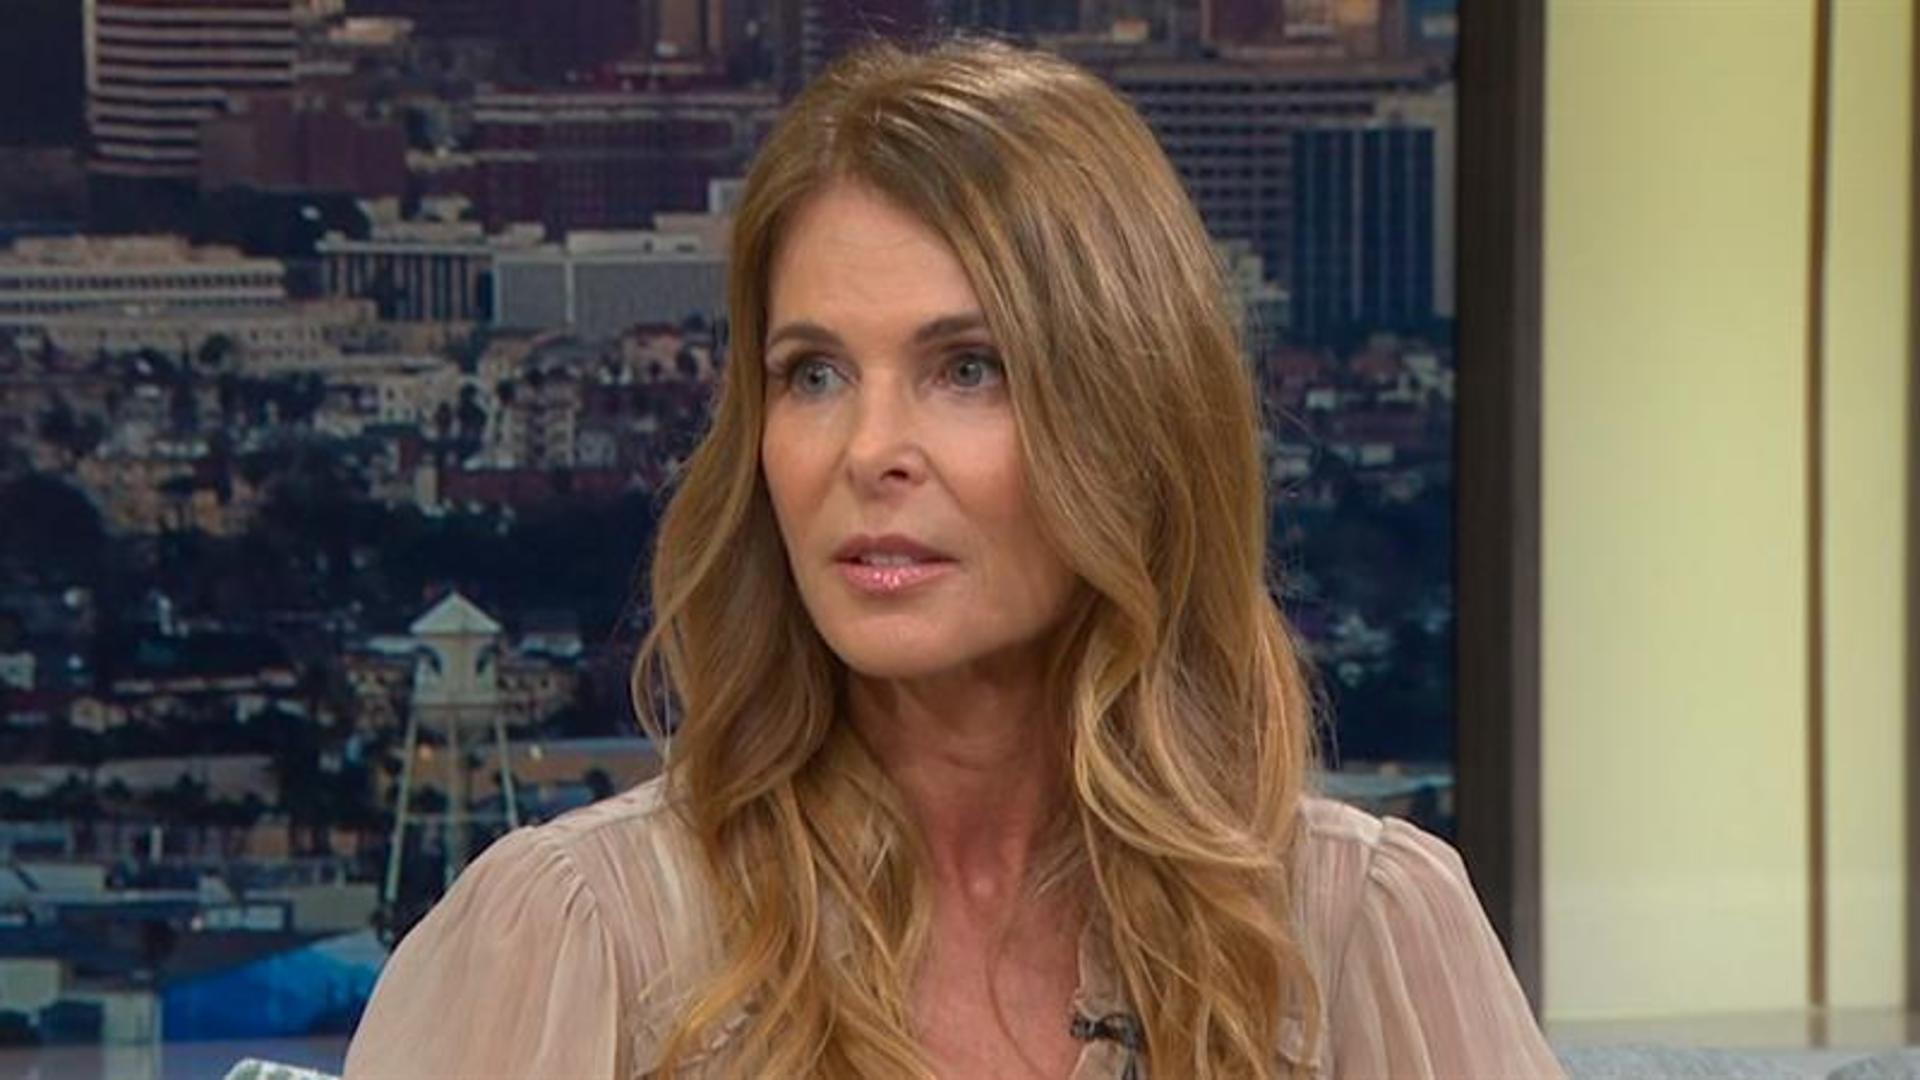 NXIVM Co-Founder Nancy Salzman Pleads Guilty In Sex Slave Case